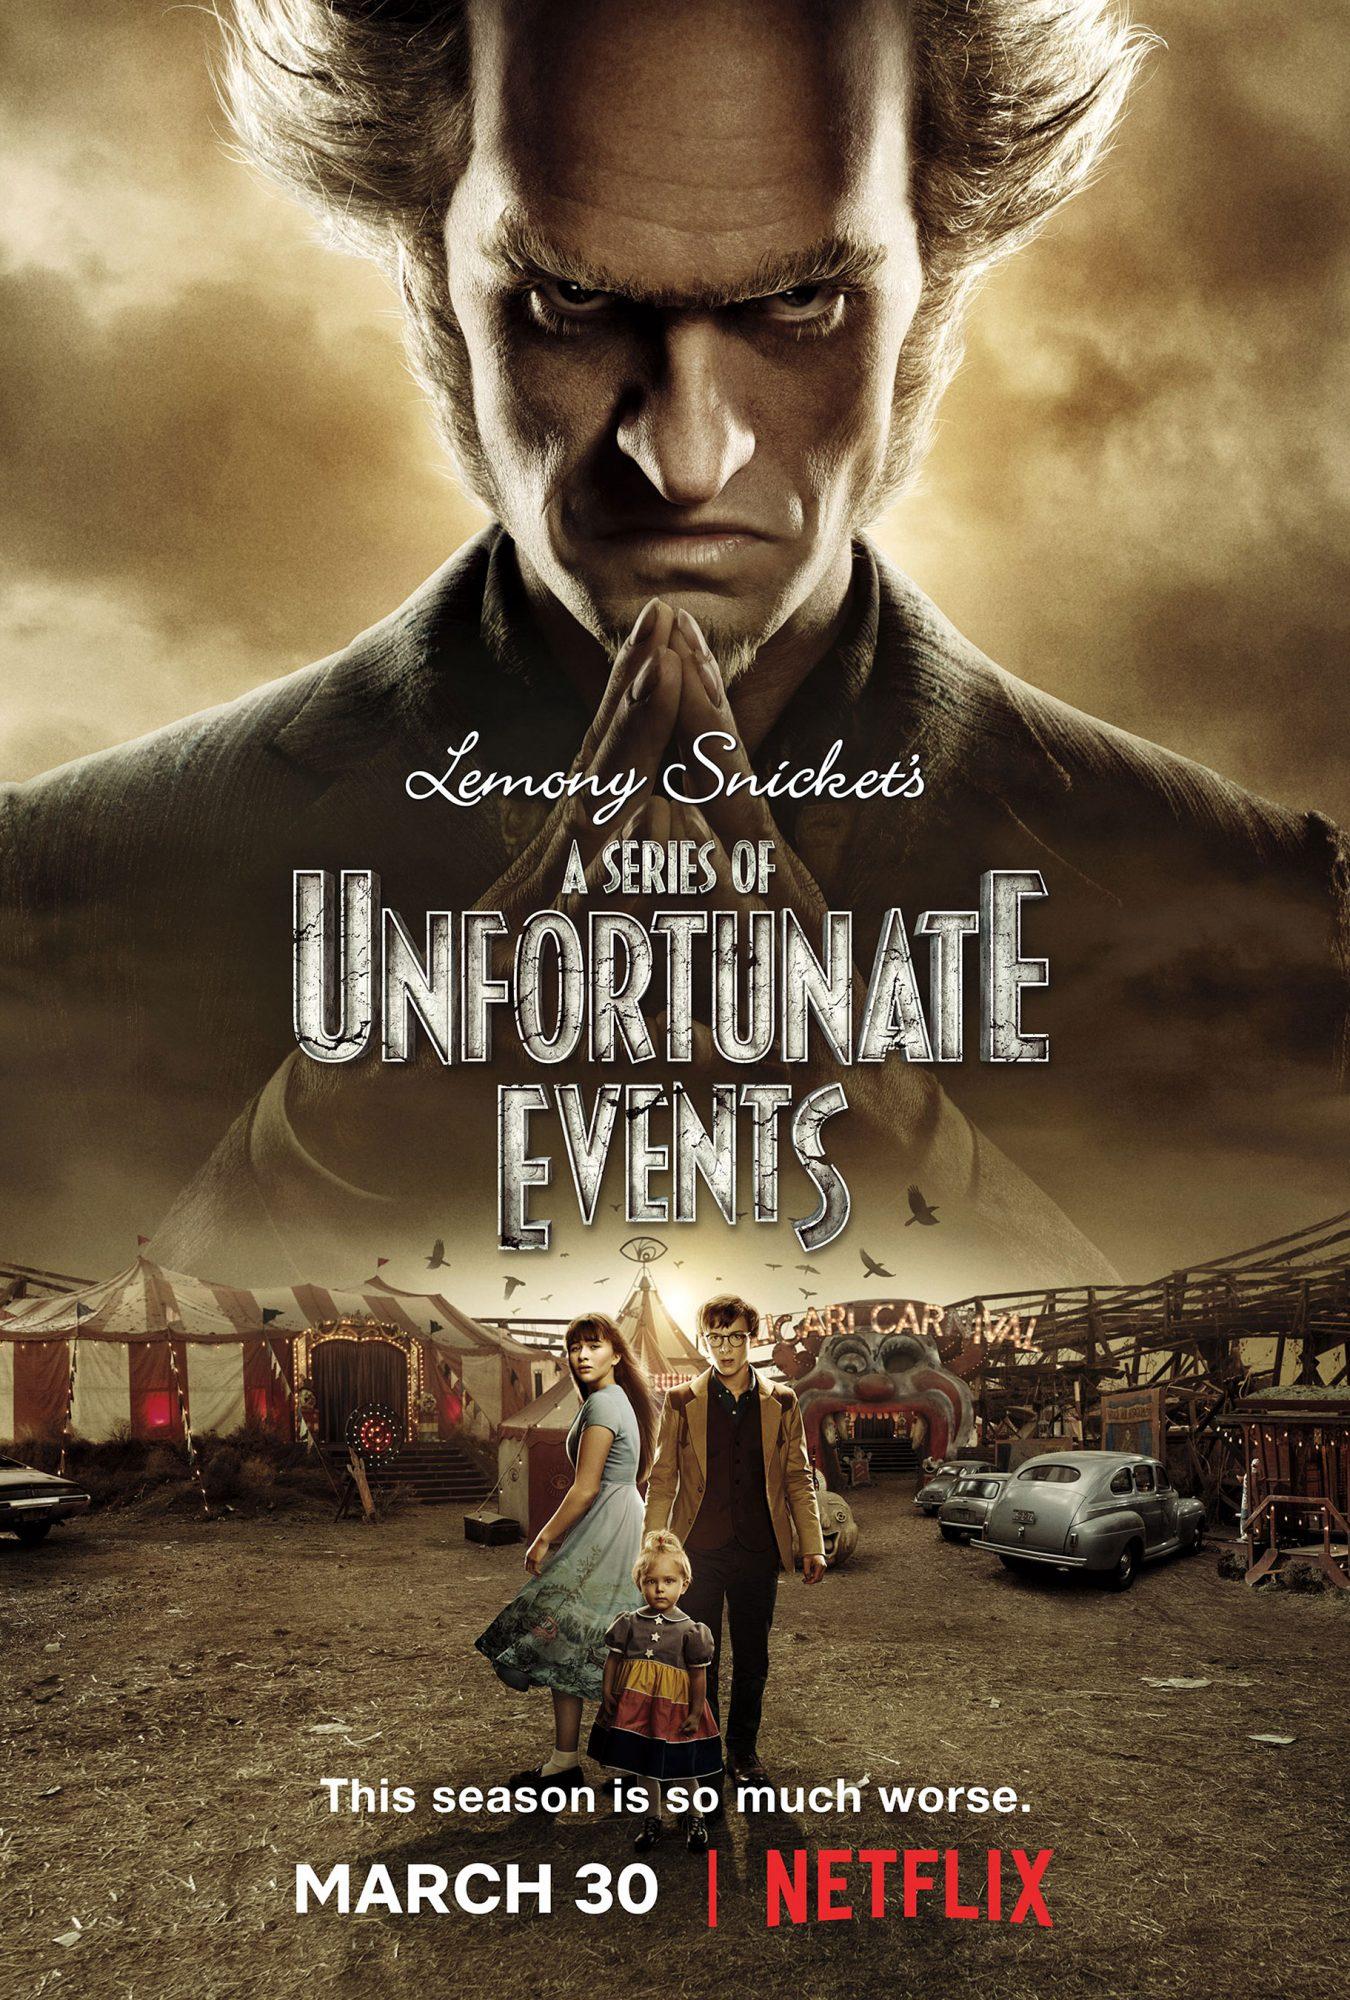 A Series of Unfortunate EventsCredit: Netflix